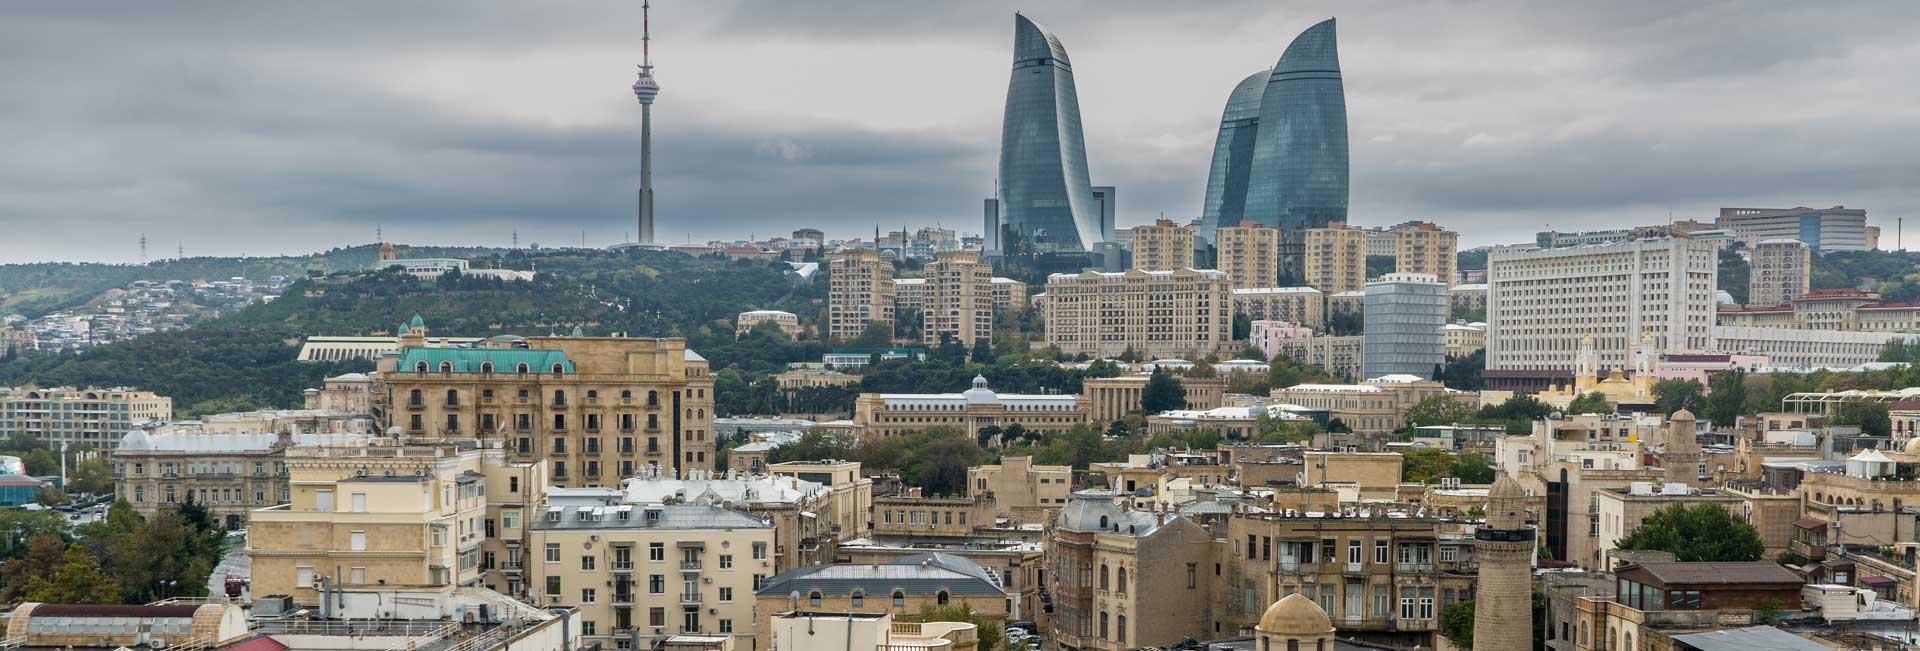 Panoramic view of Baku from Maiden Tower. Photo credit: Jered Gorman